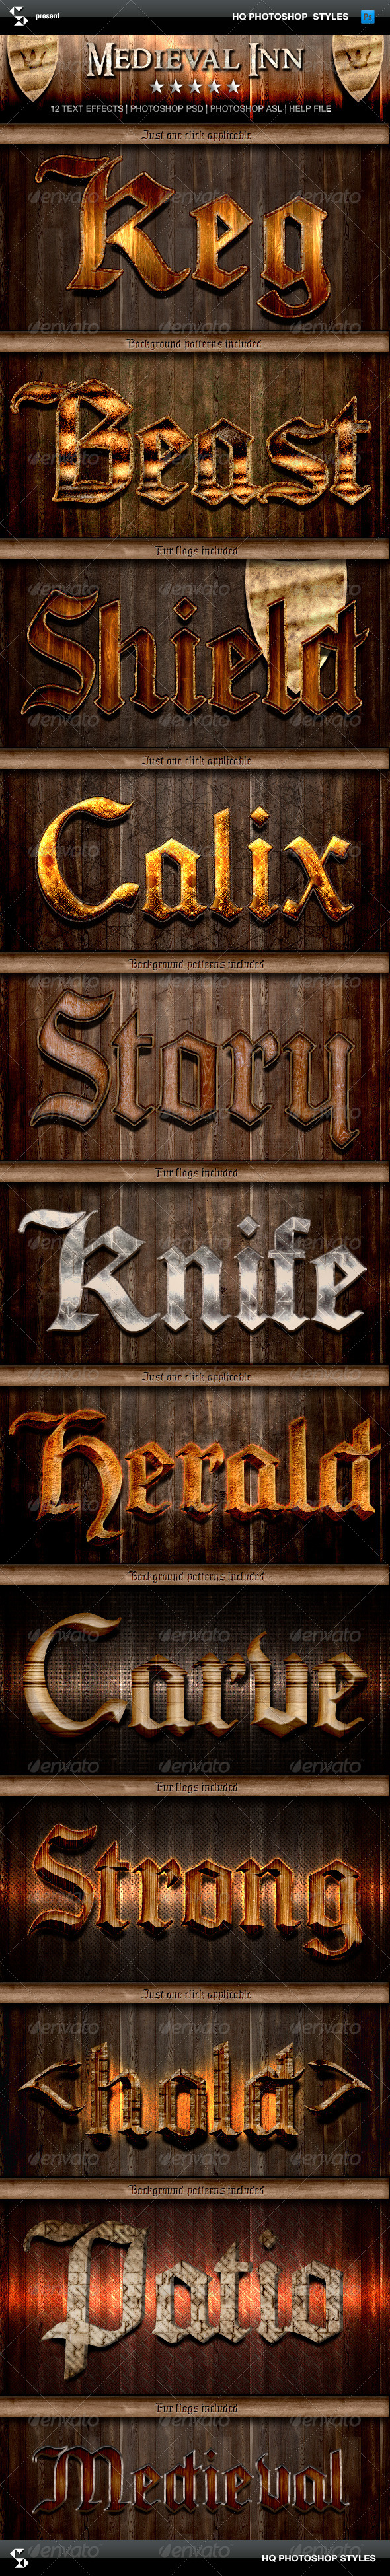 GraphicRiver Fantasy Styles Medieval Inn 6598650